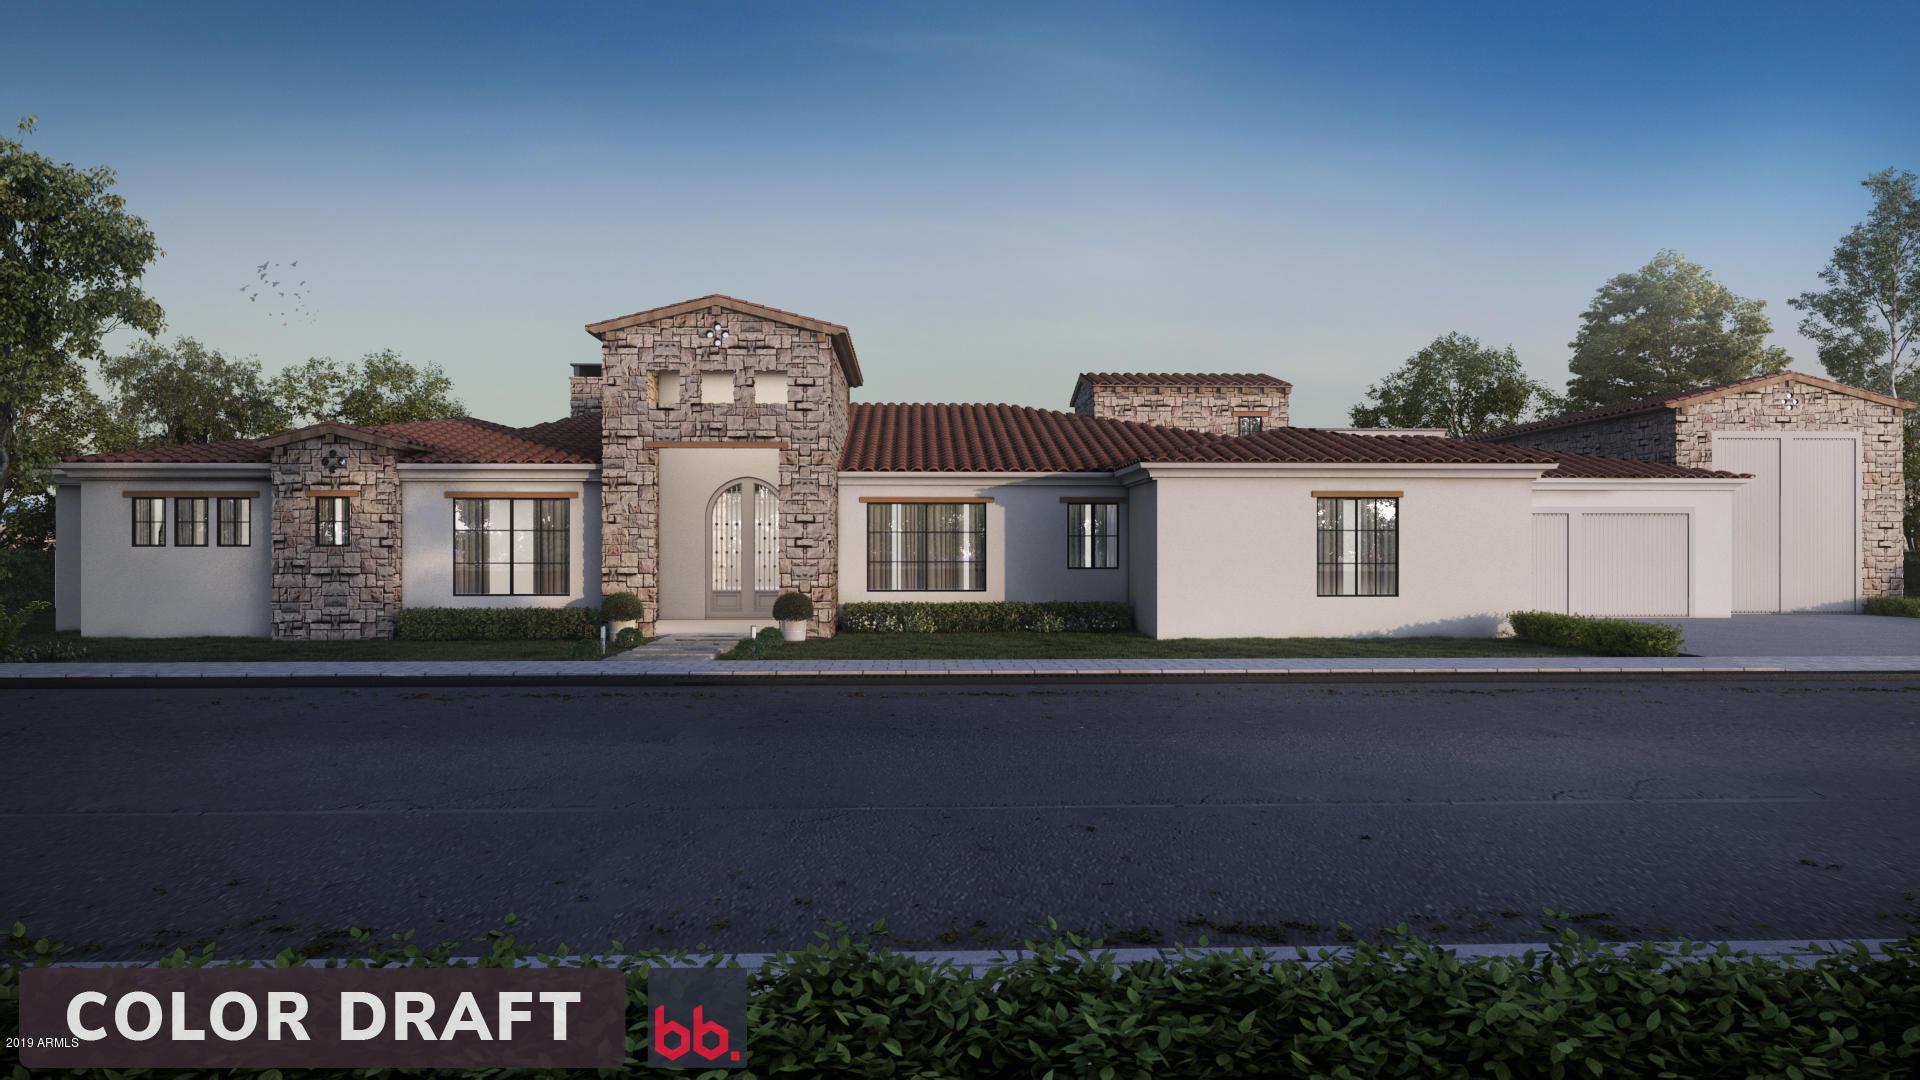 MLS 5961267 6350 E LOMAS VERDES Drive, Scottsdale, AZ 85266 Scottsdale AZ Private Pool